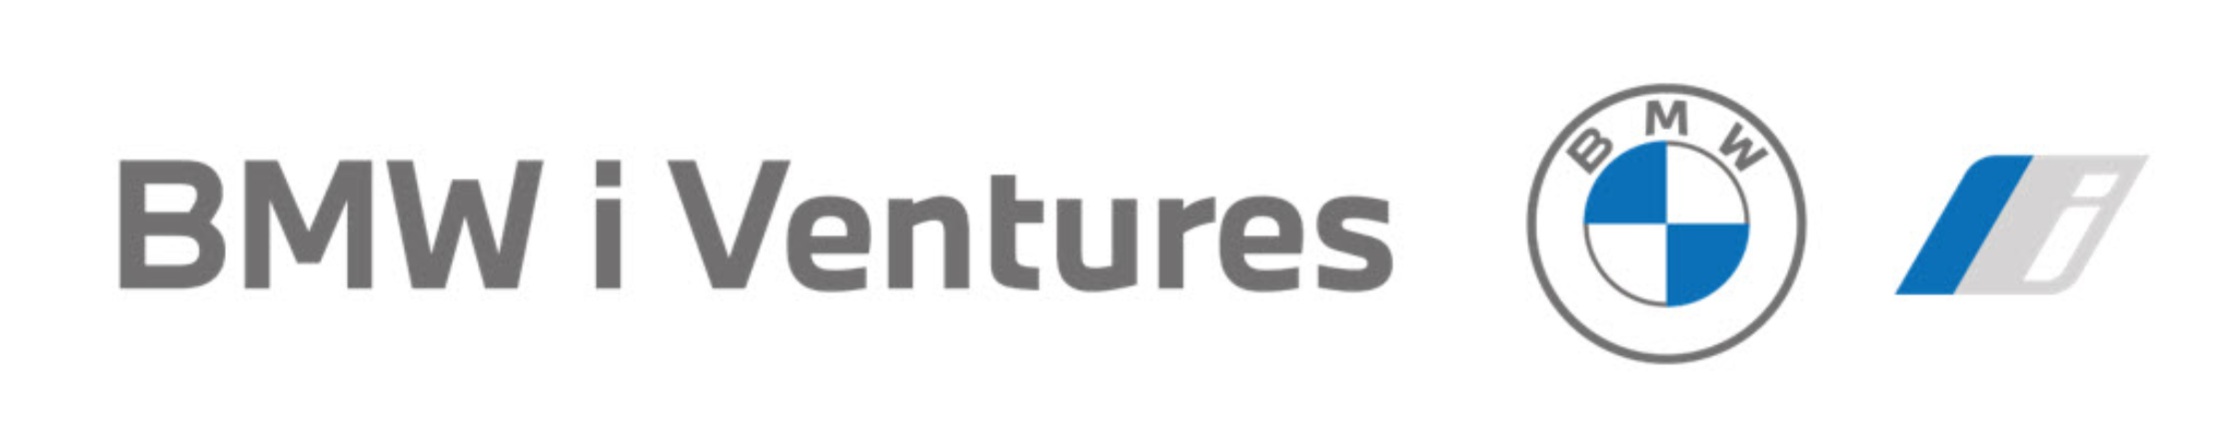 BMW i Ventures logo